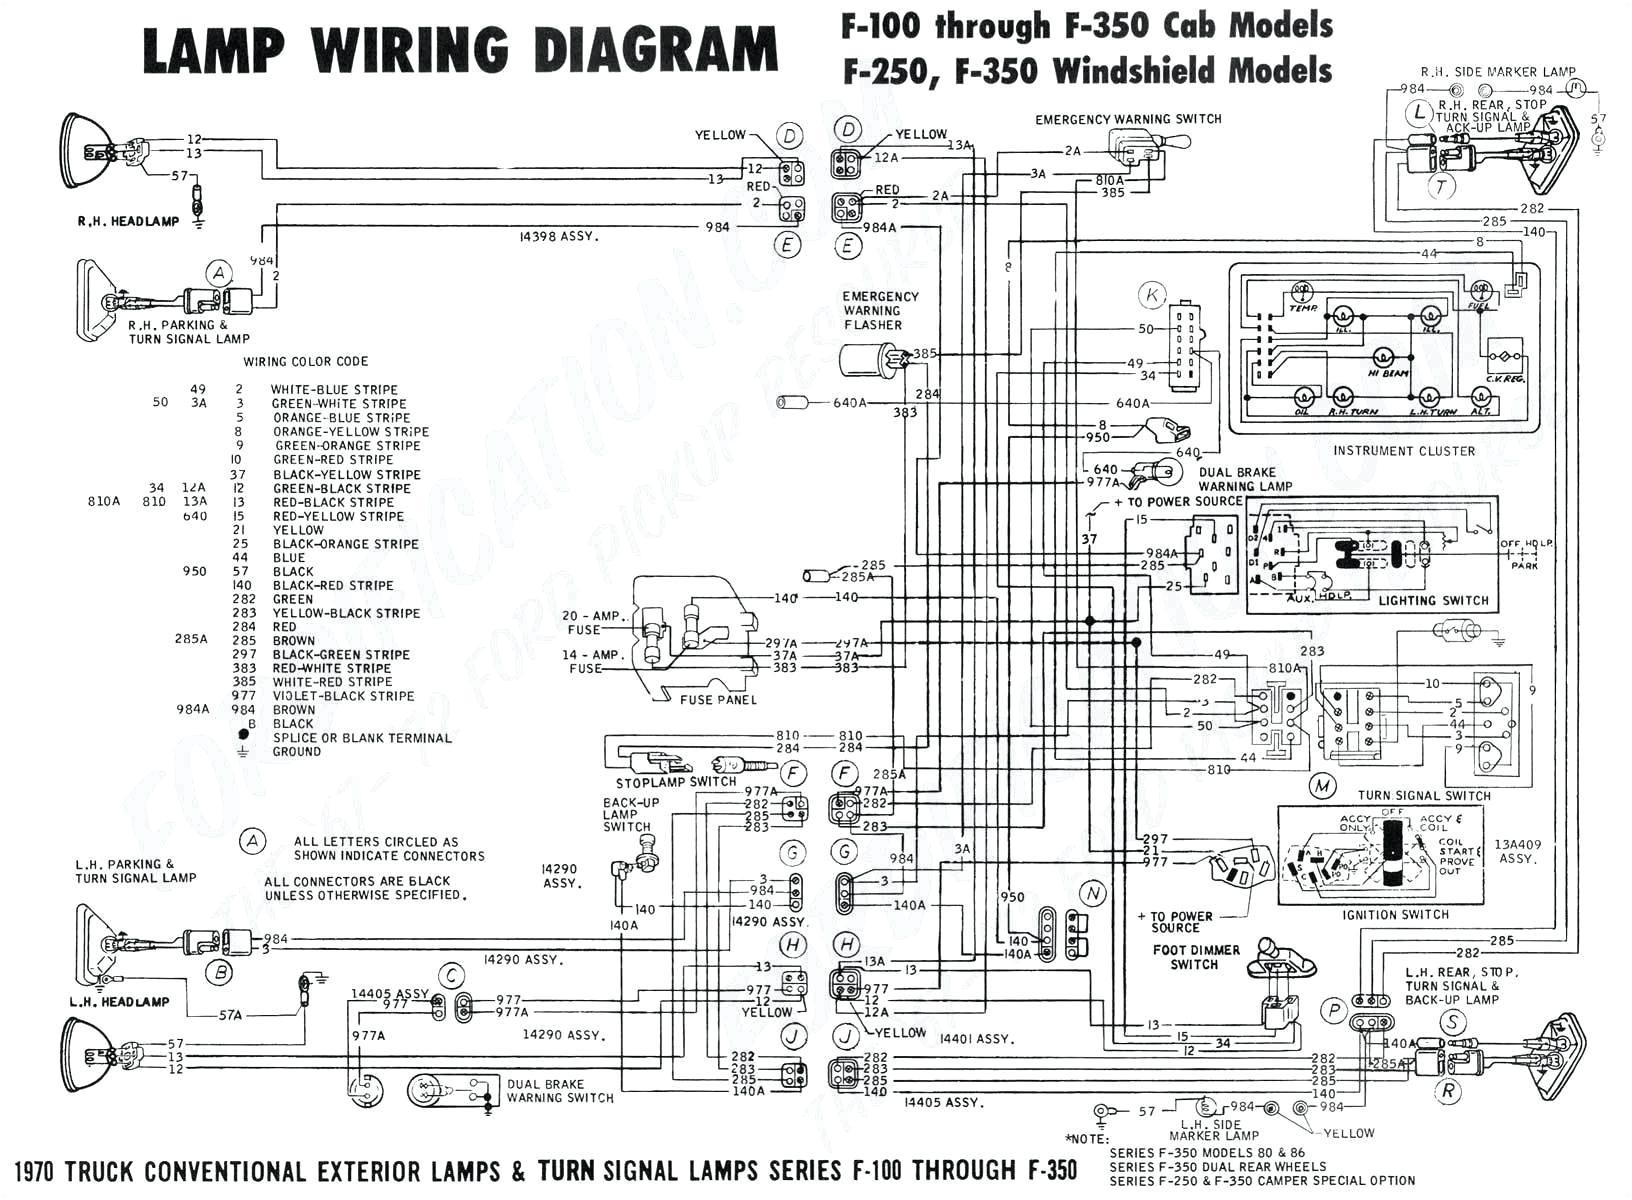 mercedes benz 300e engine diagram online manuual of wiring diagram 92 mercedes 2 3 engine diagram